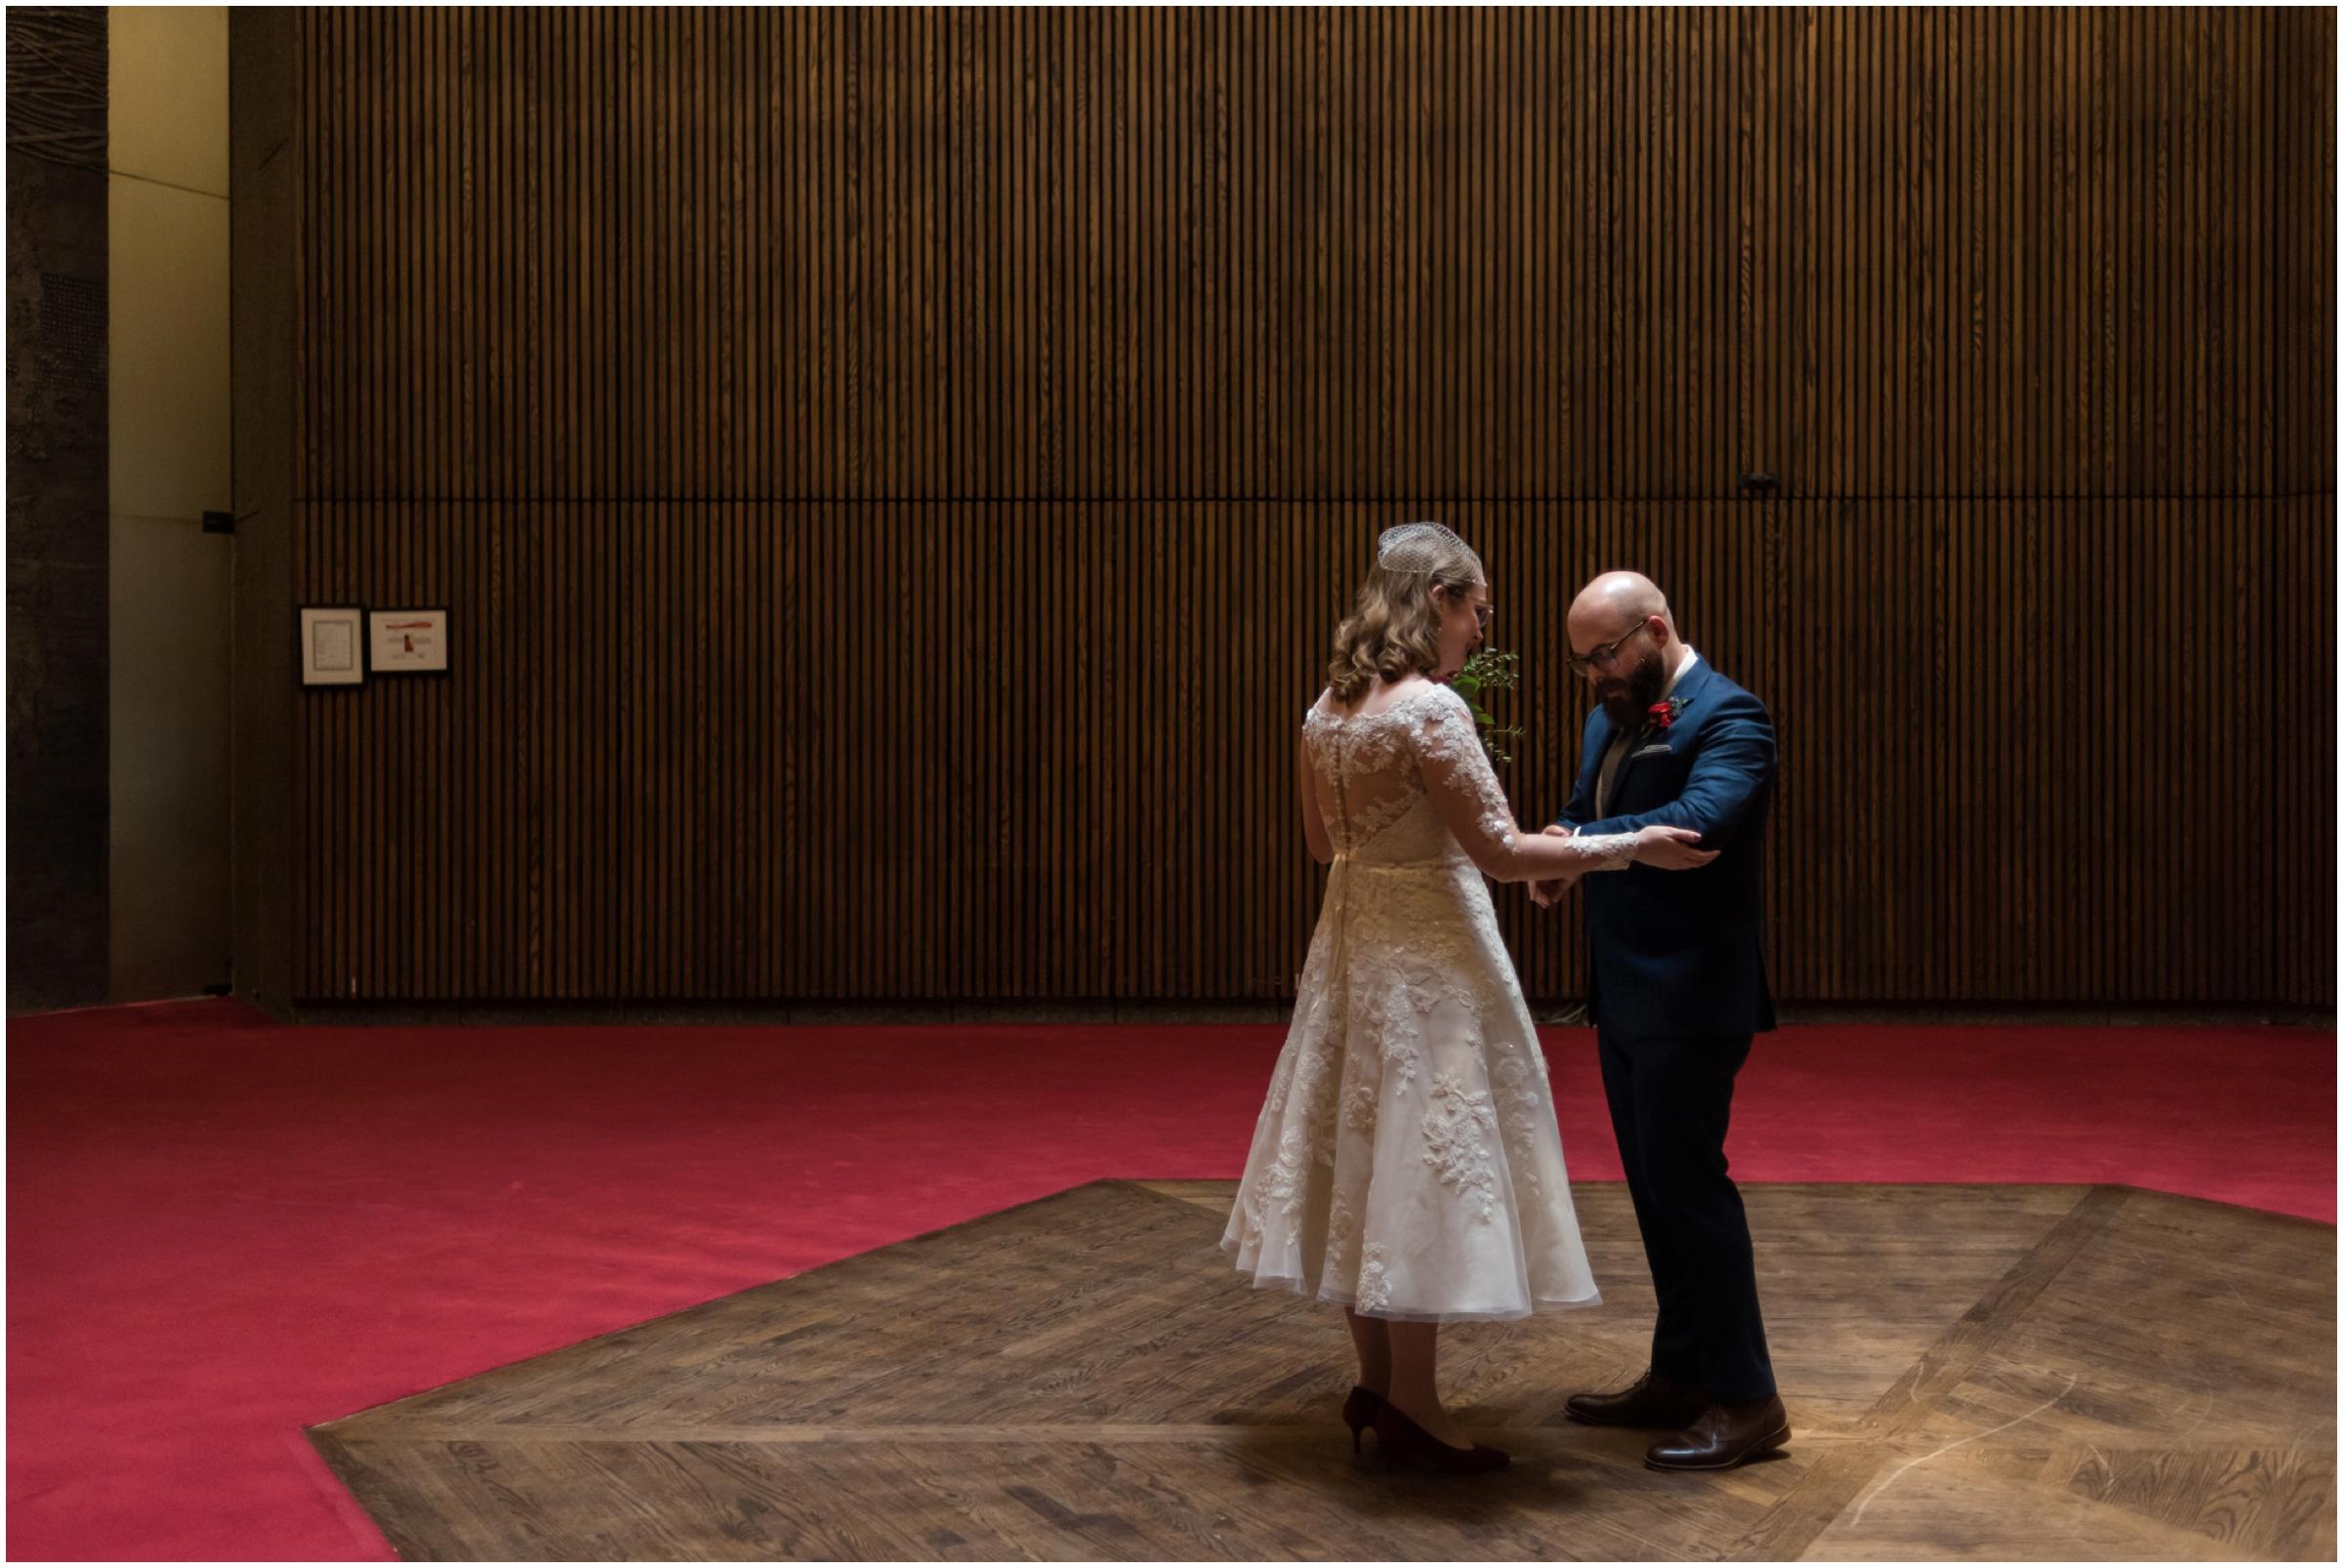 Ottaw Wedding Allison Andrew - (Selena Phillips-Boyle)_0026.jpg